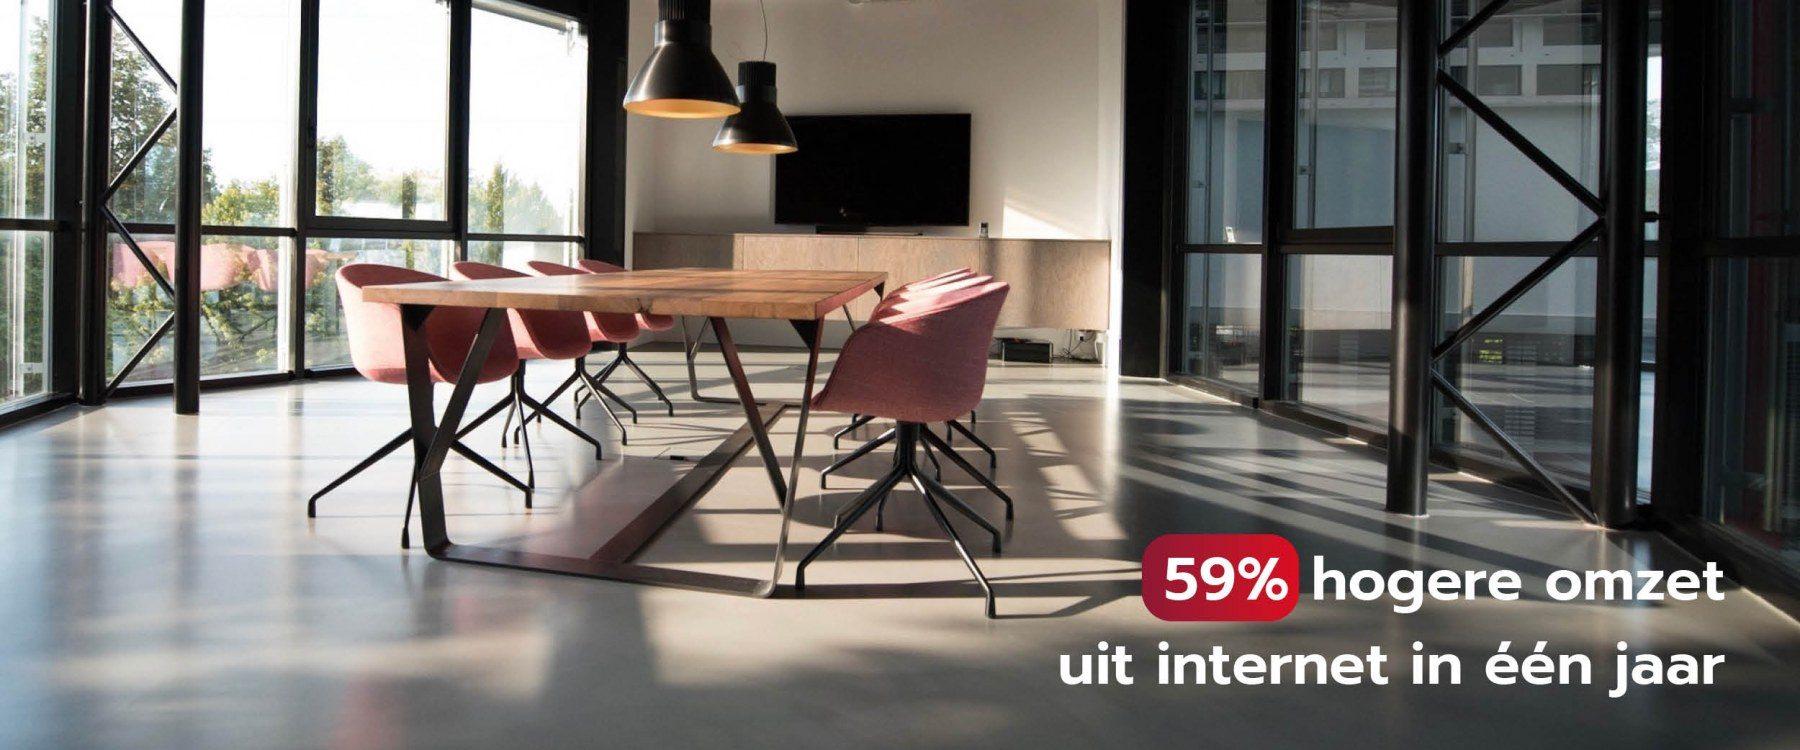 projectvloeren nederland google ads case